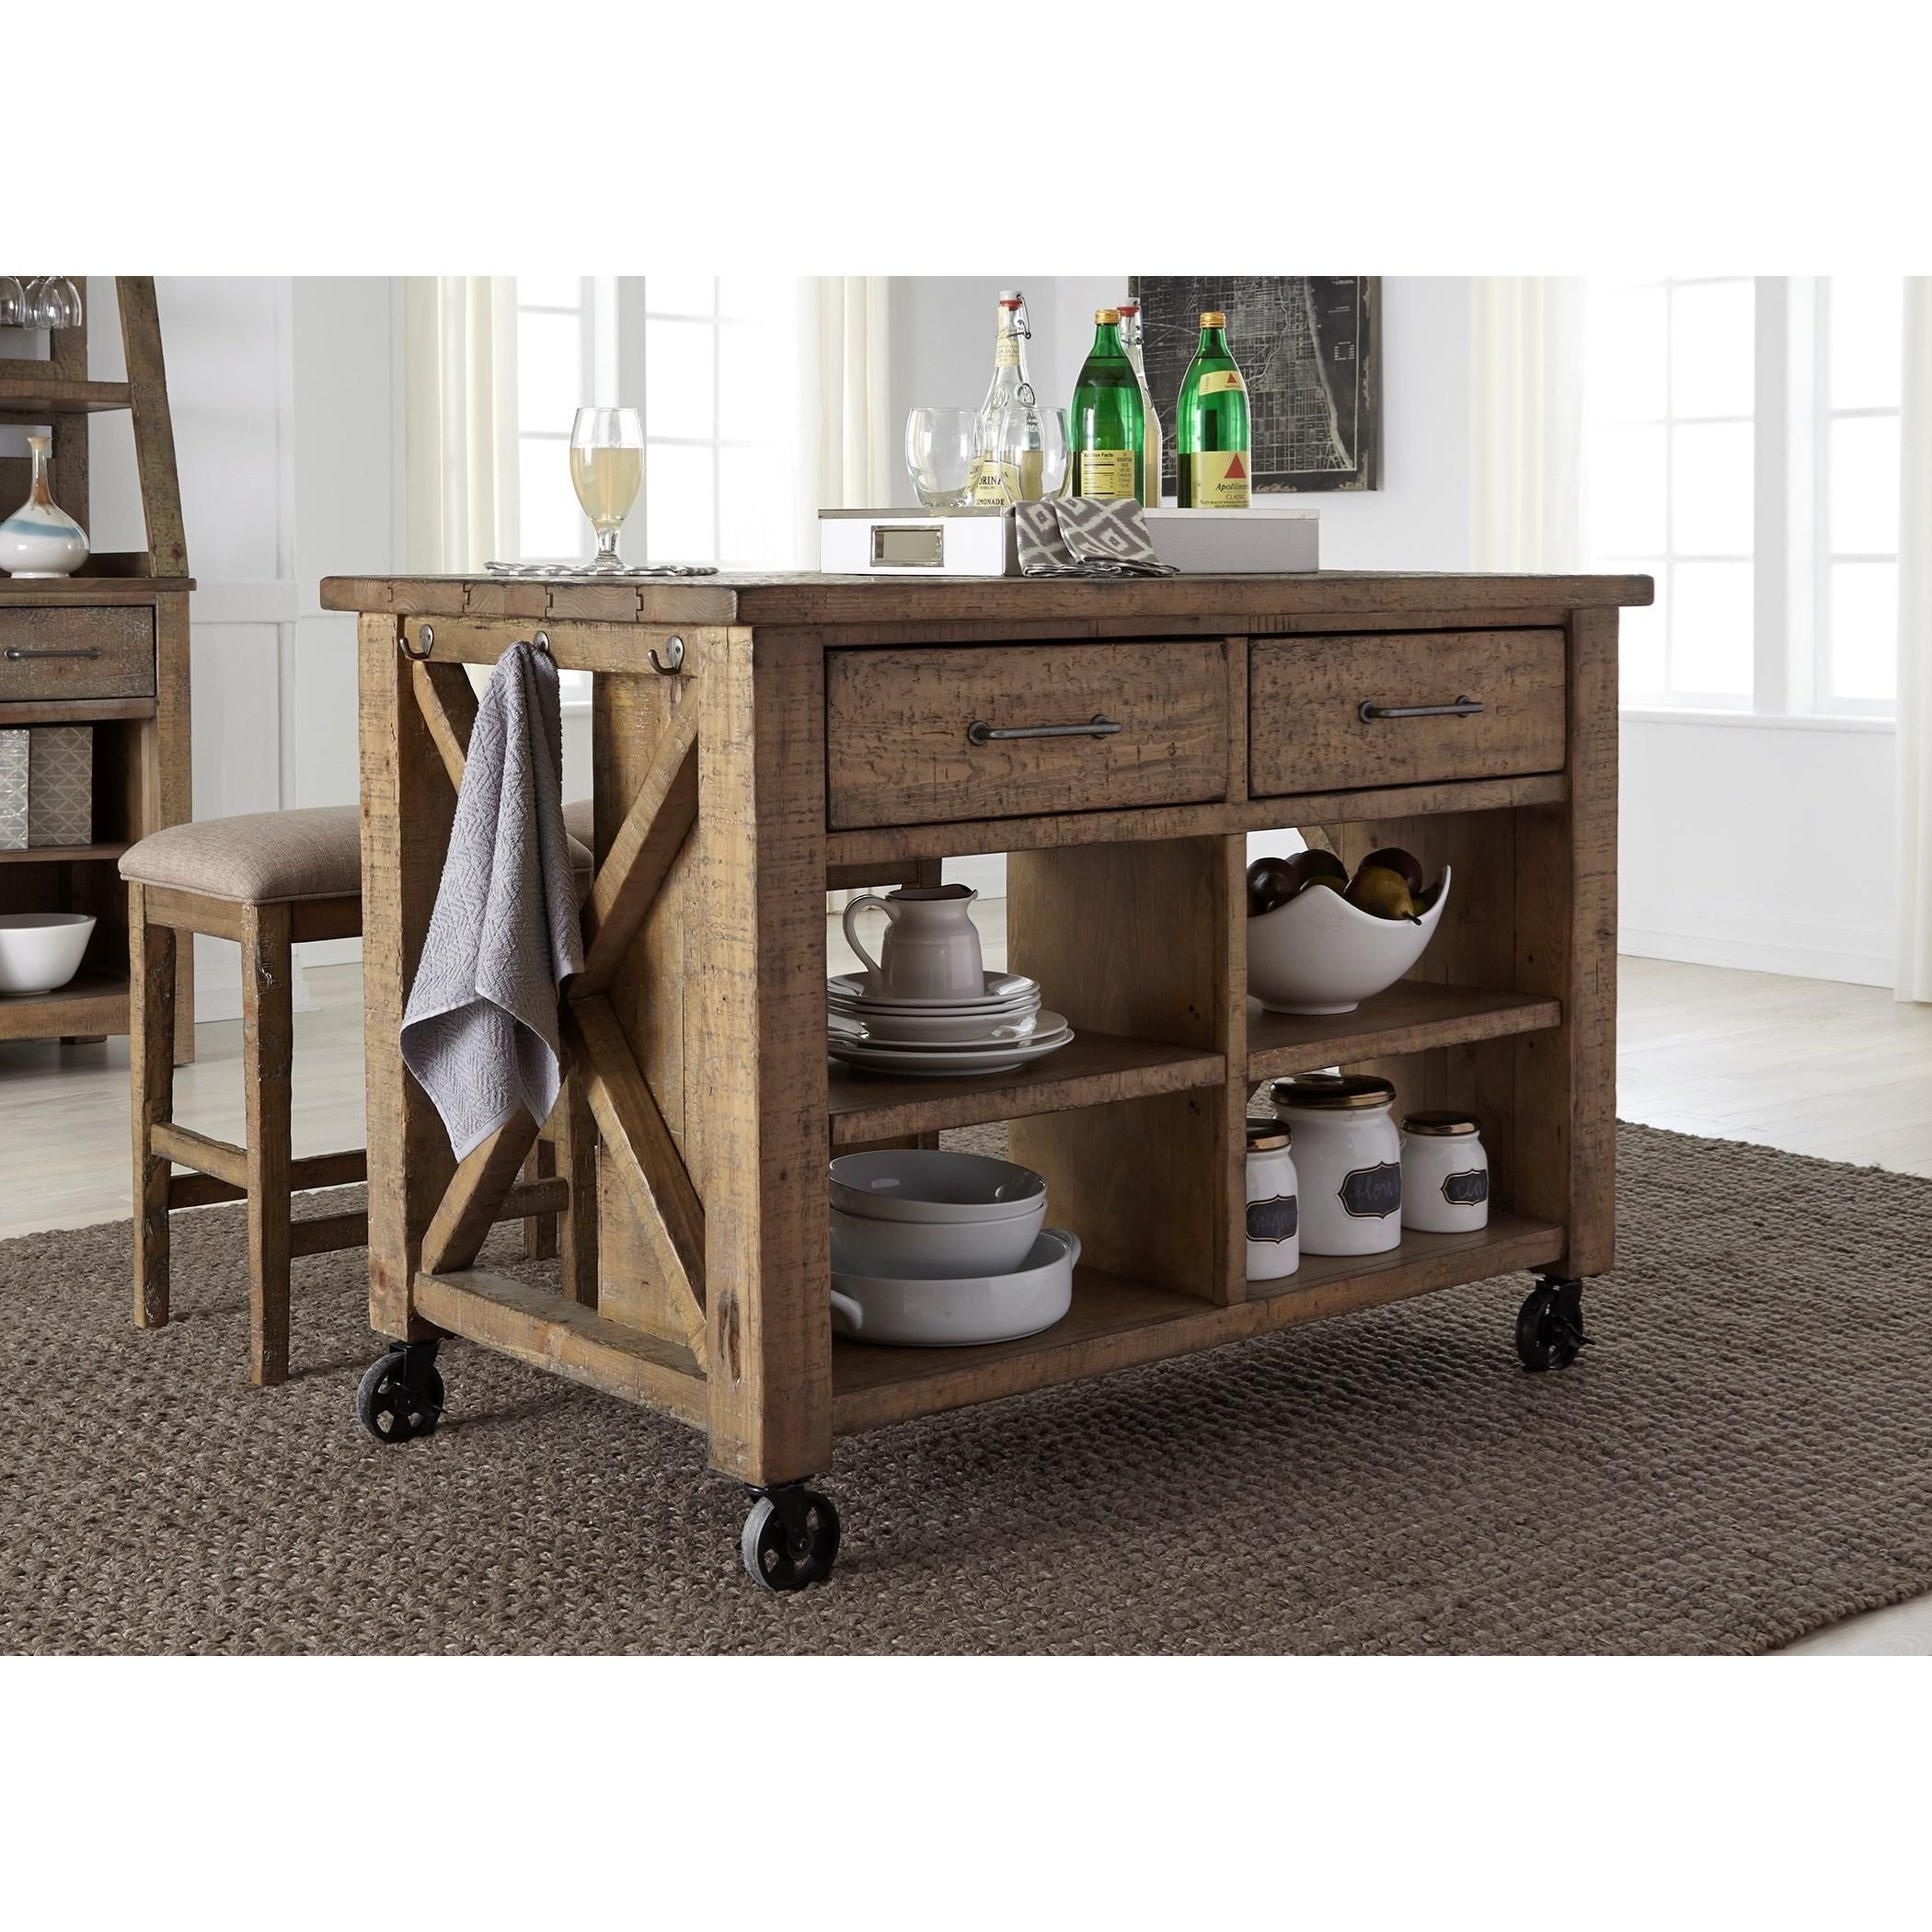 furniture drawers manor magnolia liberty desks dresser vanity with desk